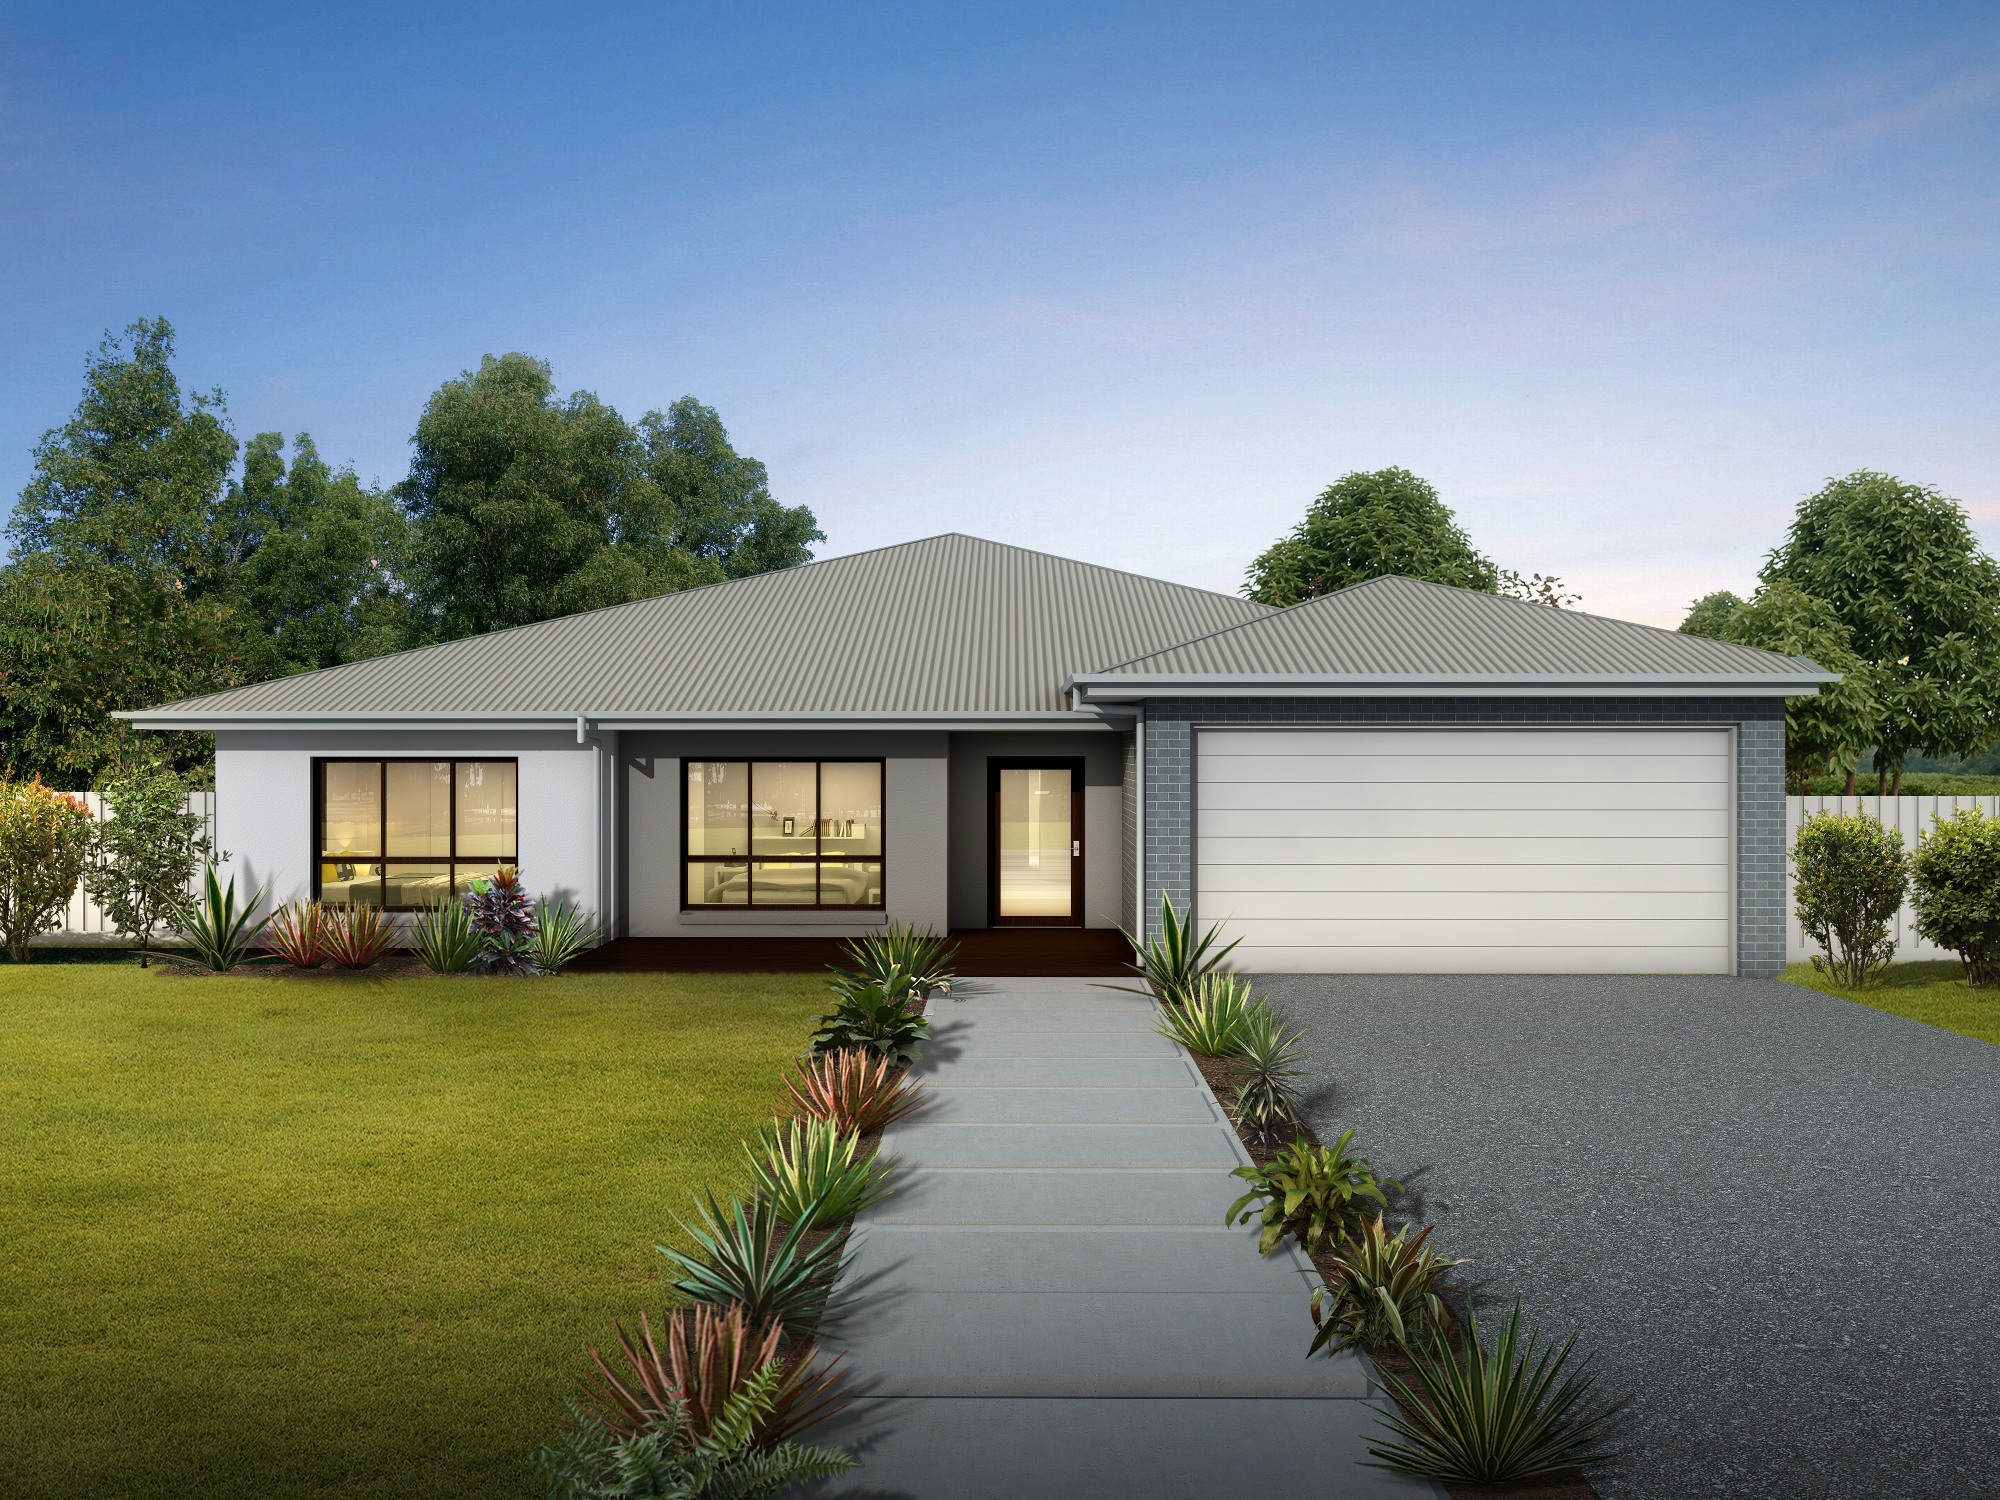 Home Design - Mintaka - T5006b